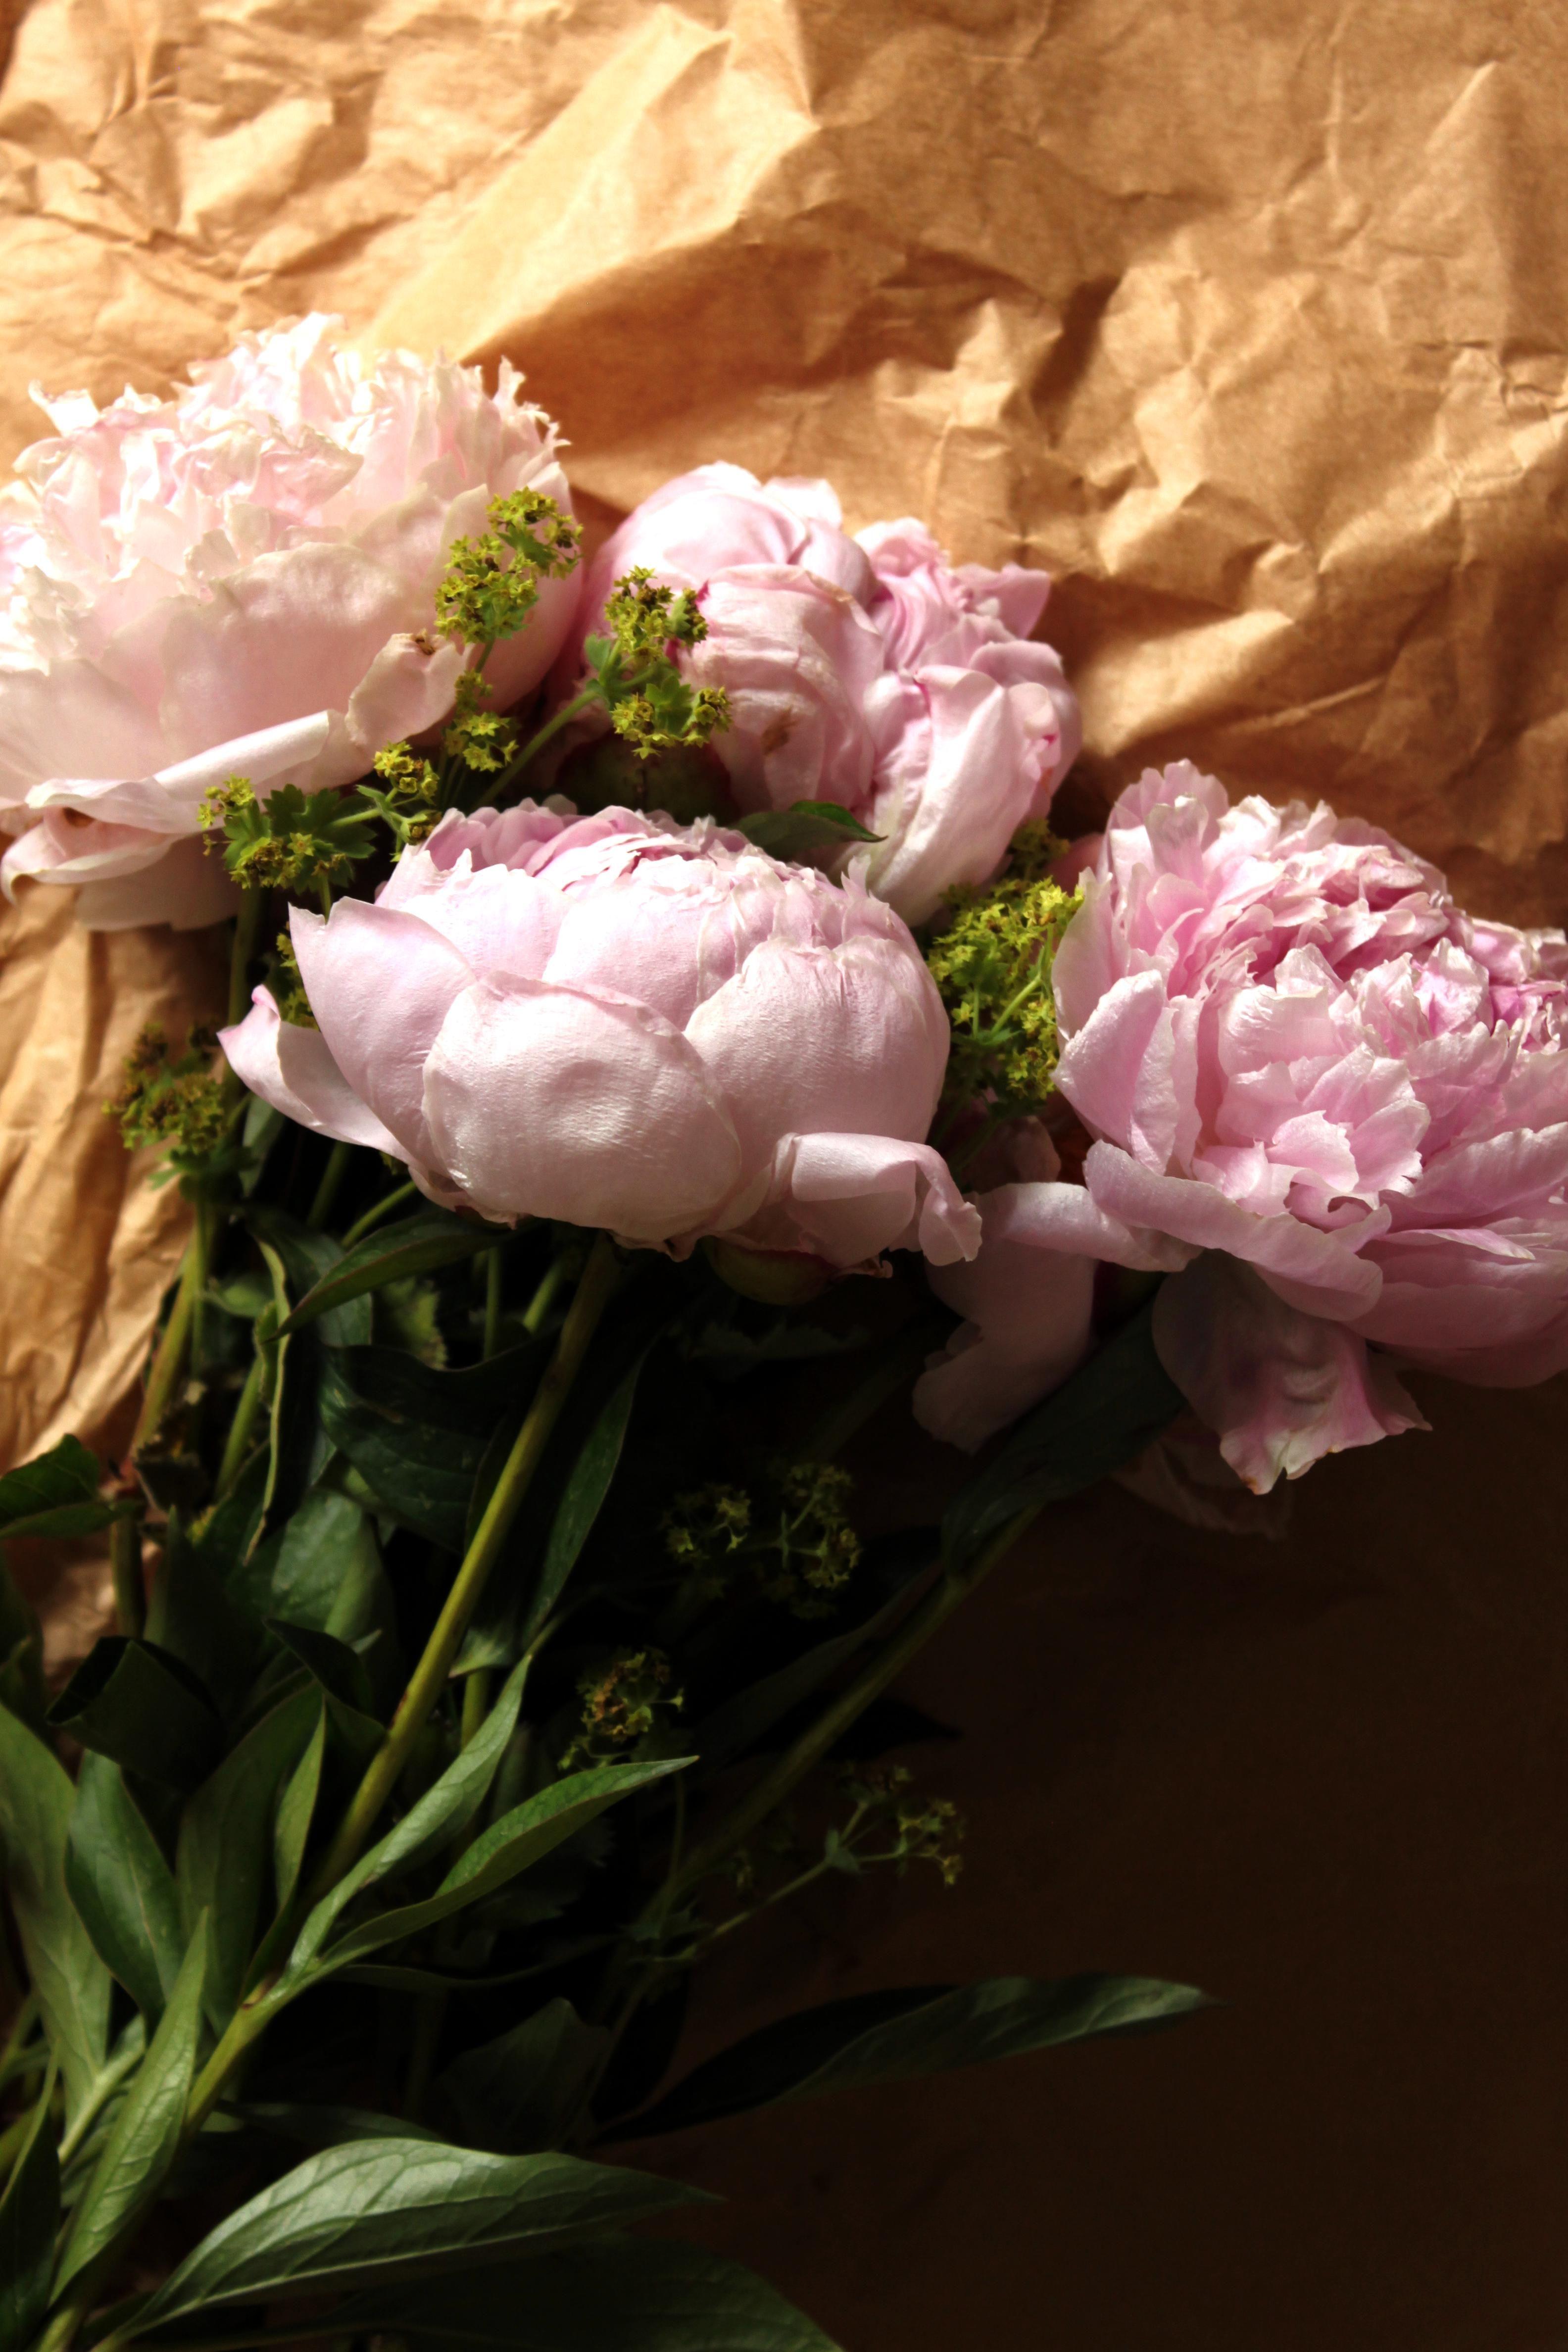 Rosa Pfingstrosen Der Sorte Sarah Bernhardt Als Schnittblume